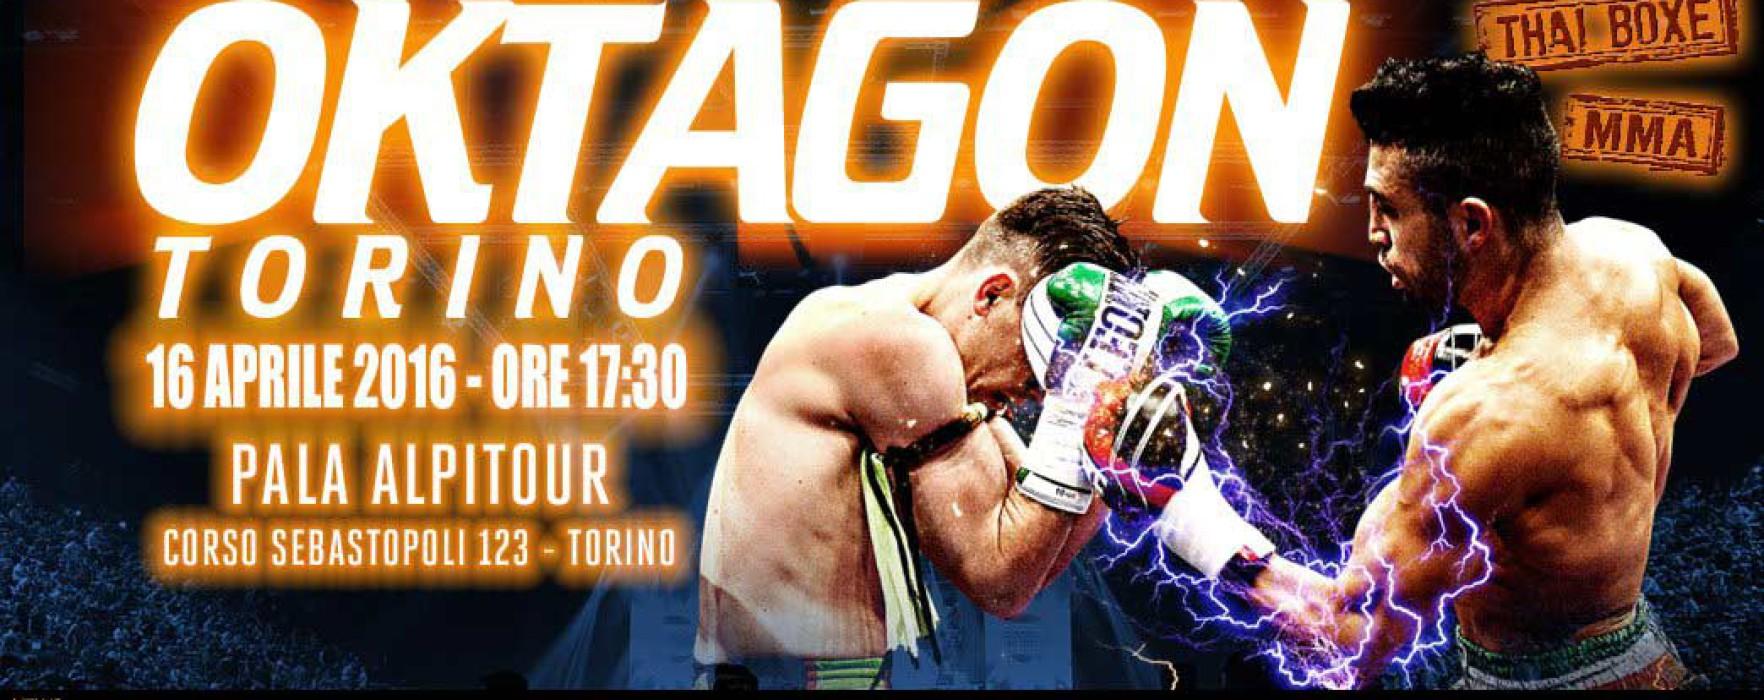 Press release: Oktagon 2016 – Turin